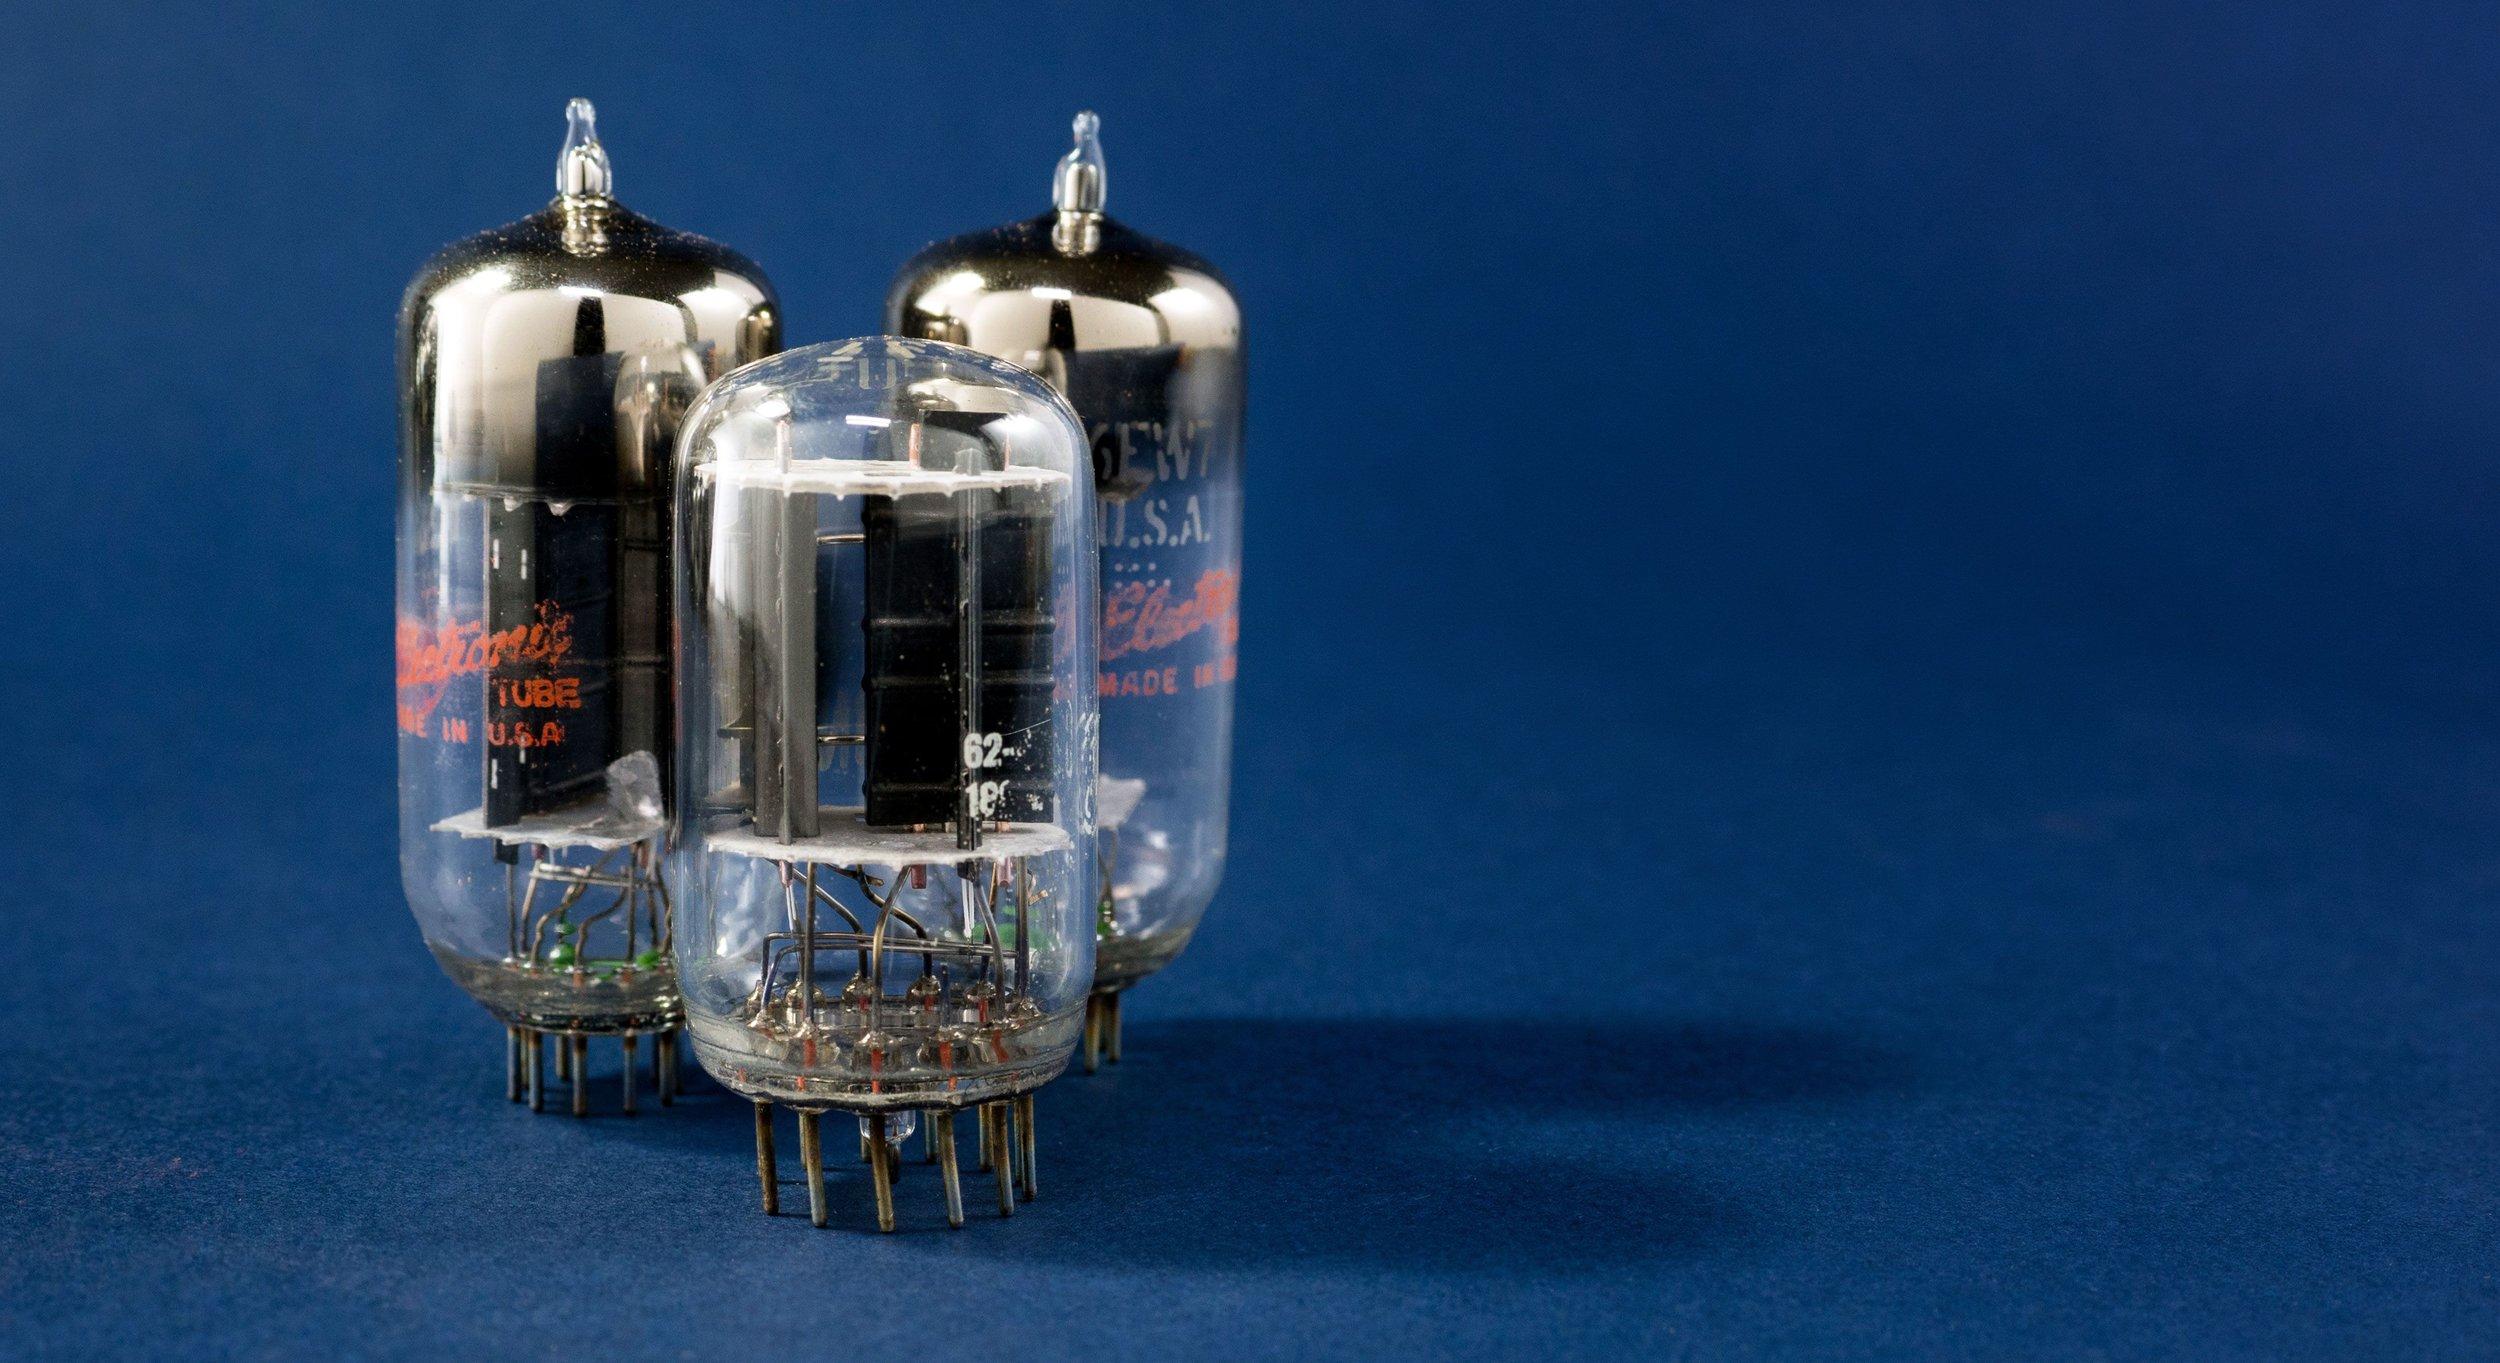 Vintage Component Spotlight: Compactron Tubes